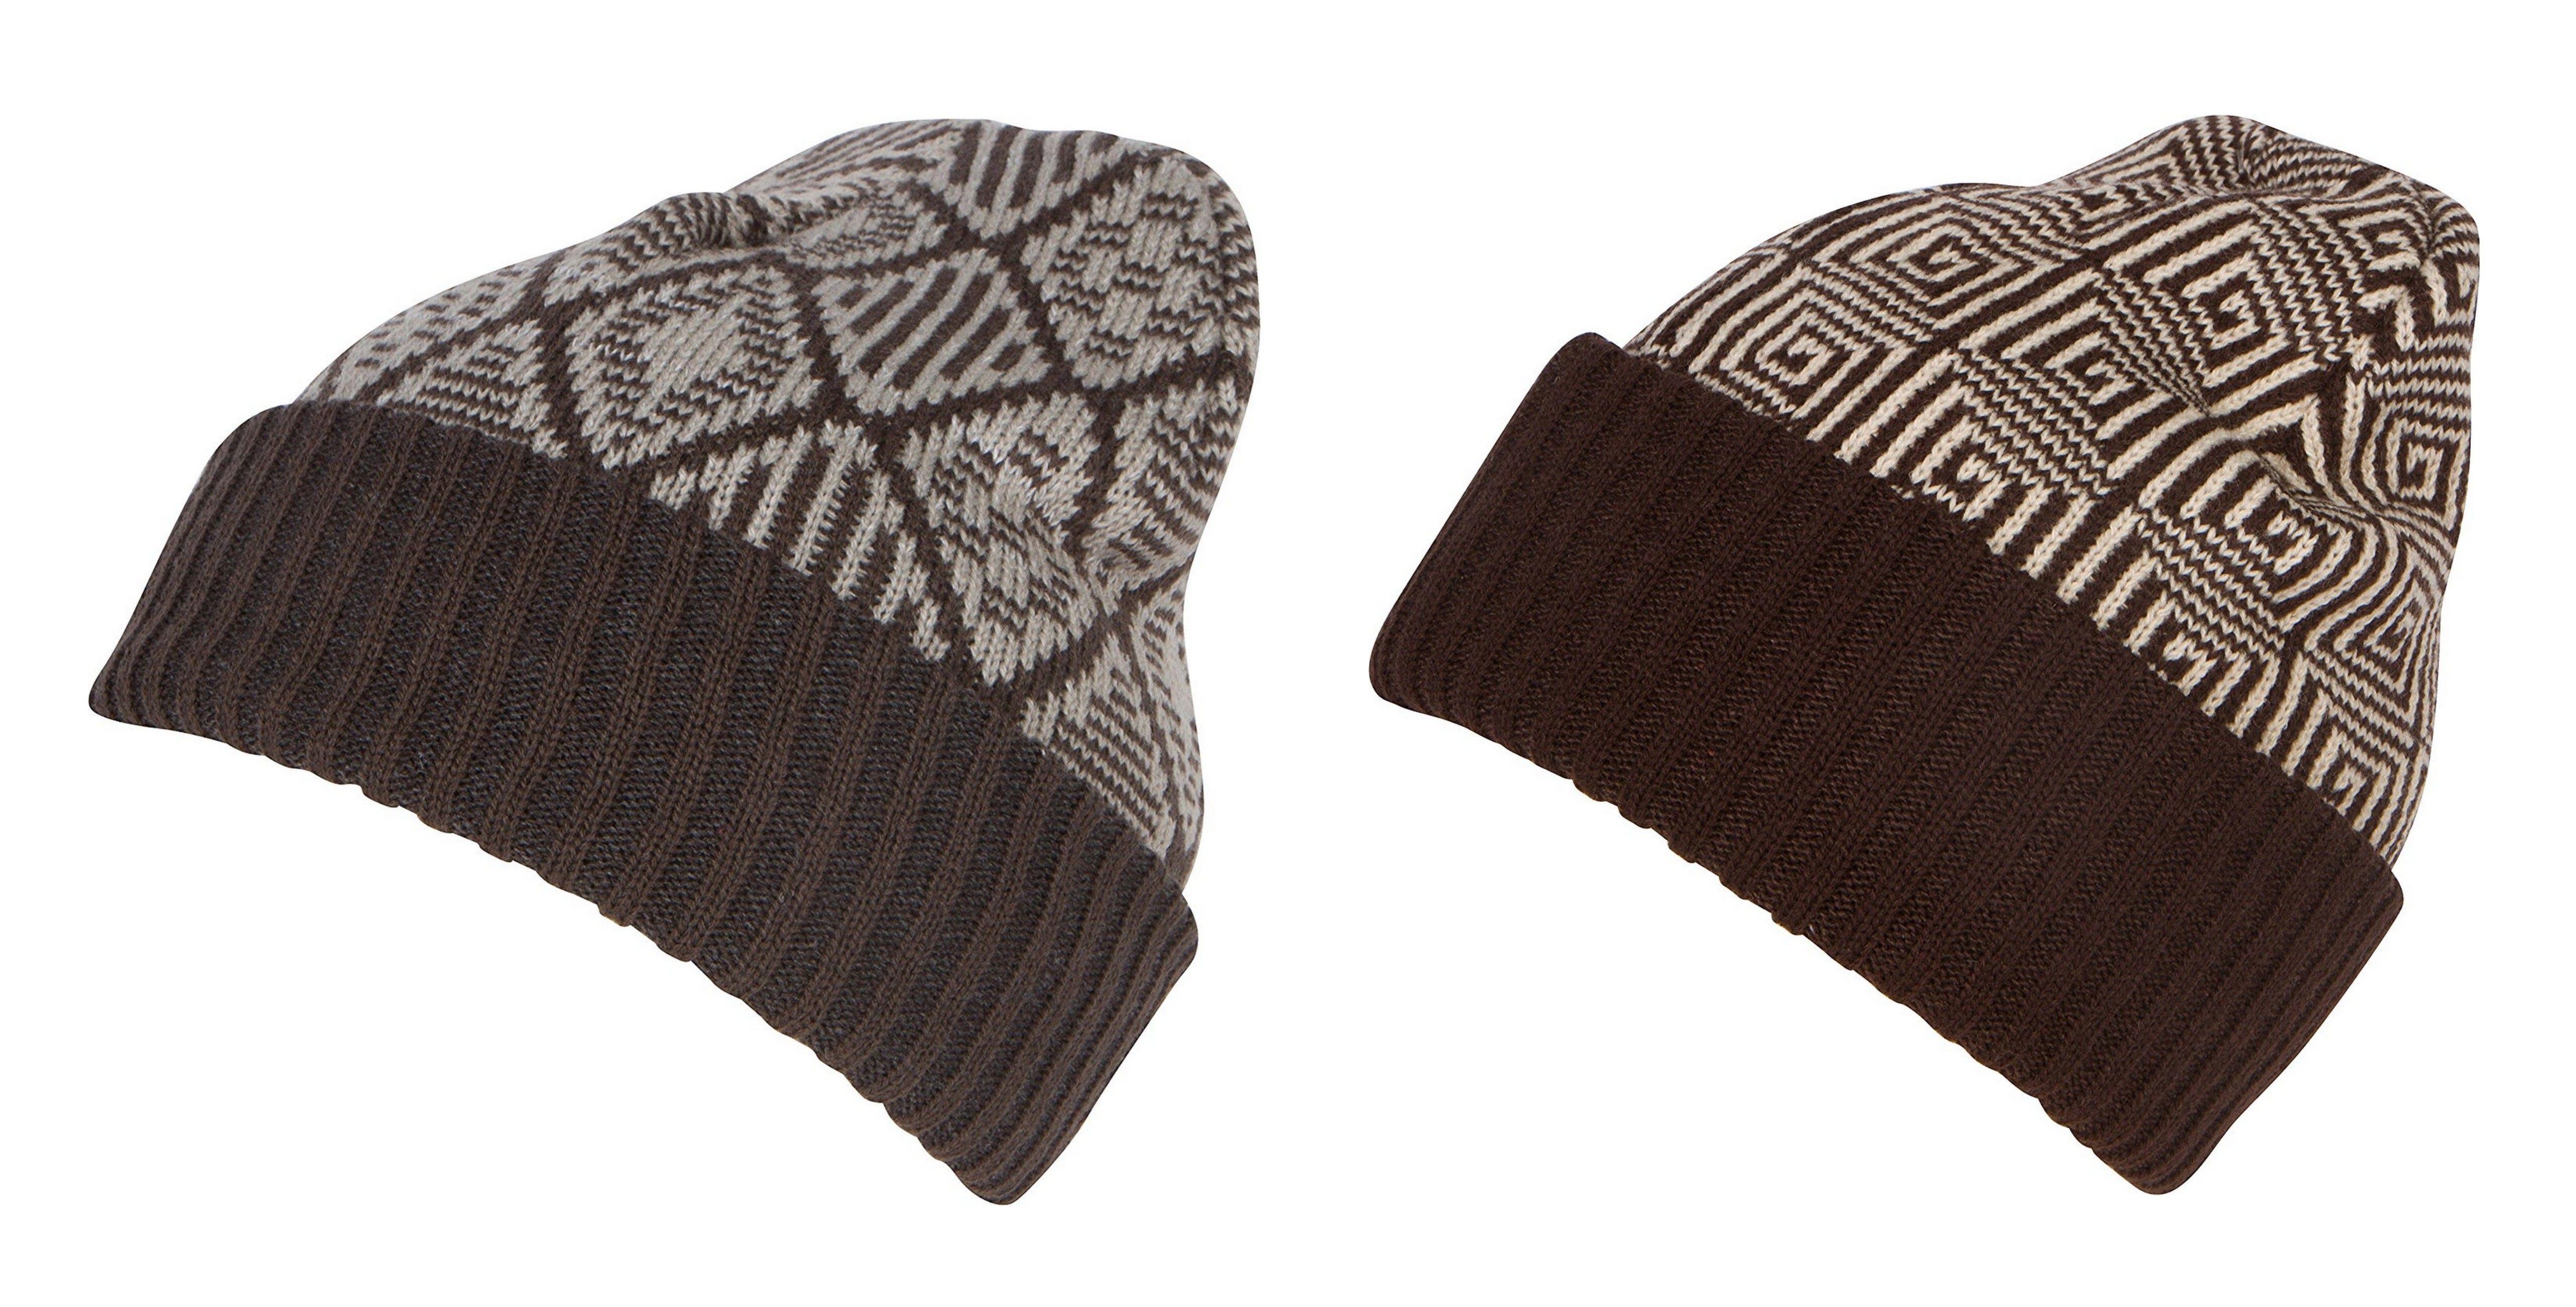 30de57c7bdd Sakkas Lucien Pattern Knit Cap Beanie Hat Warm Light Unisex